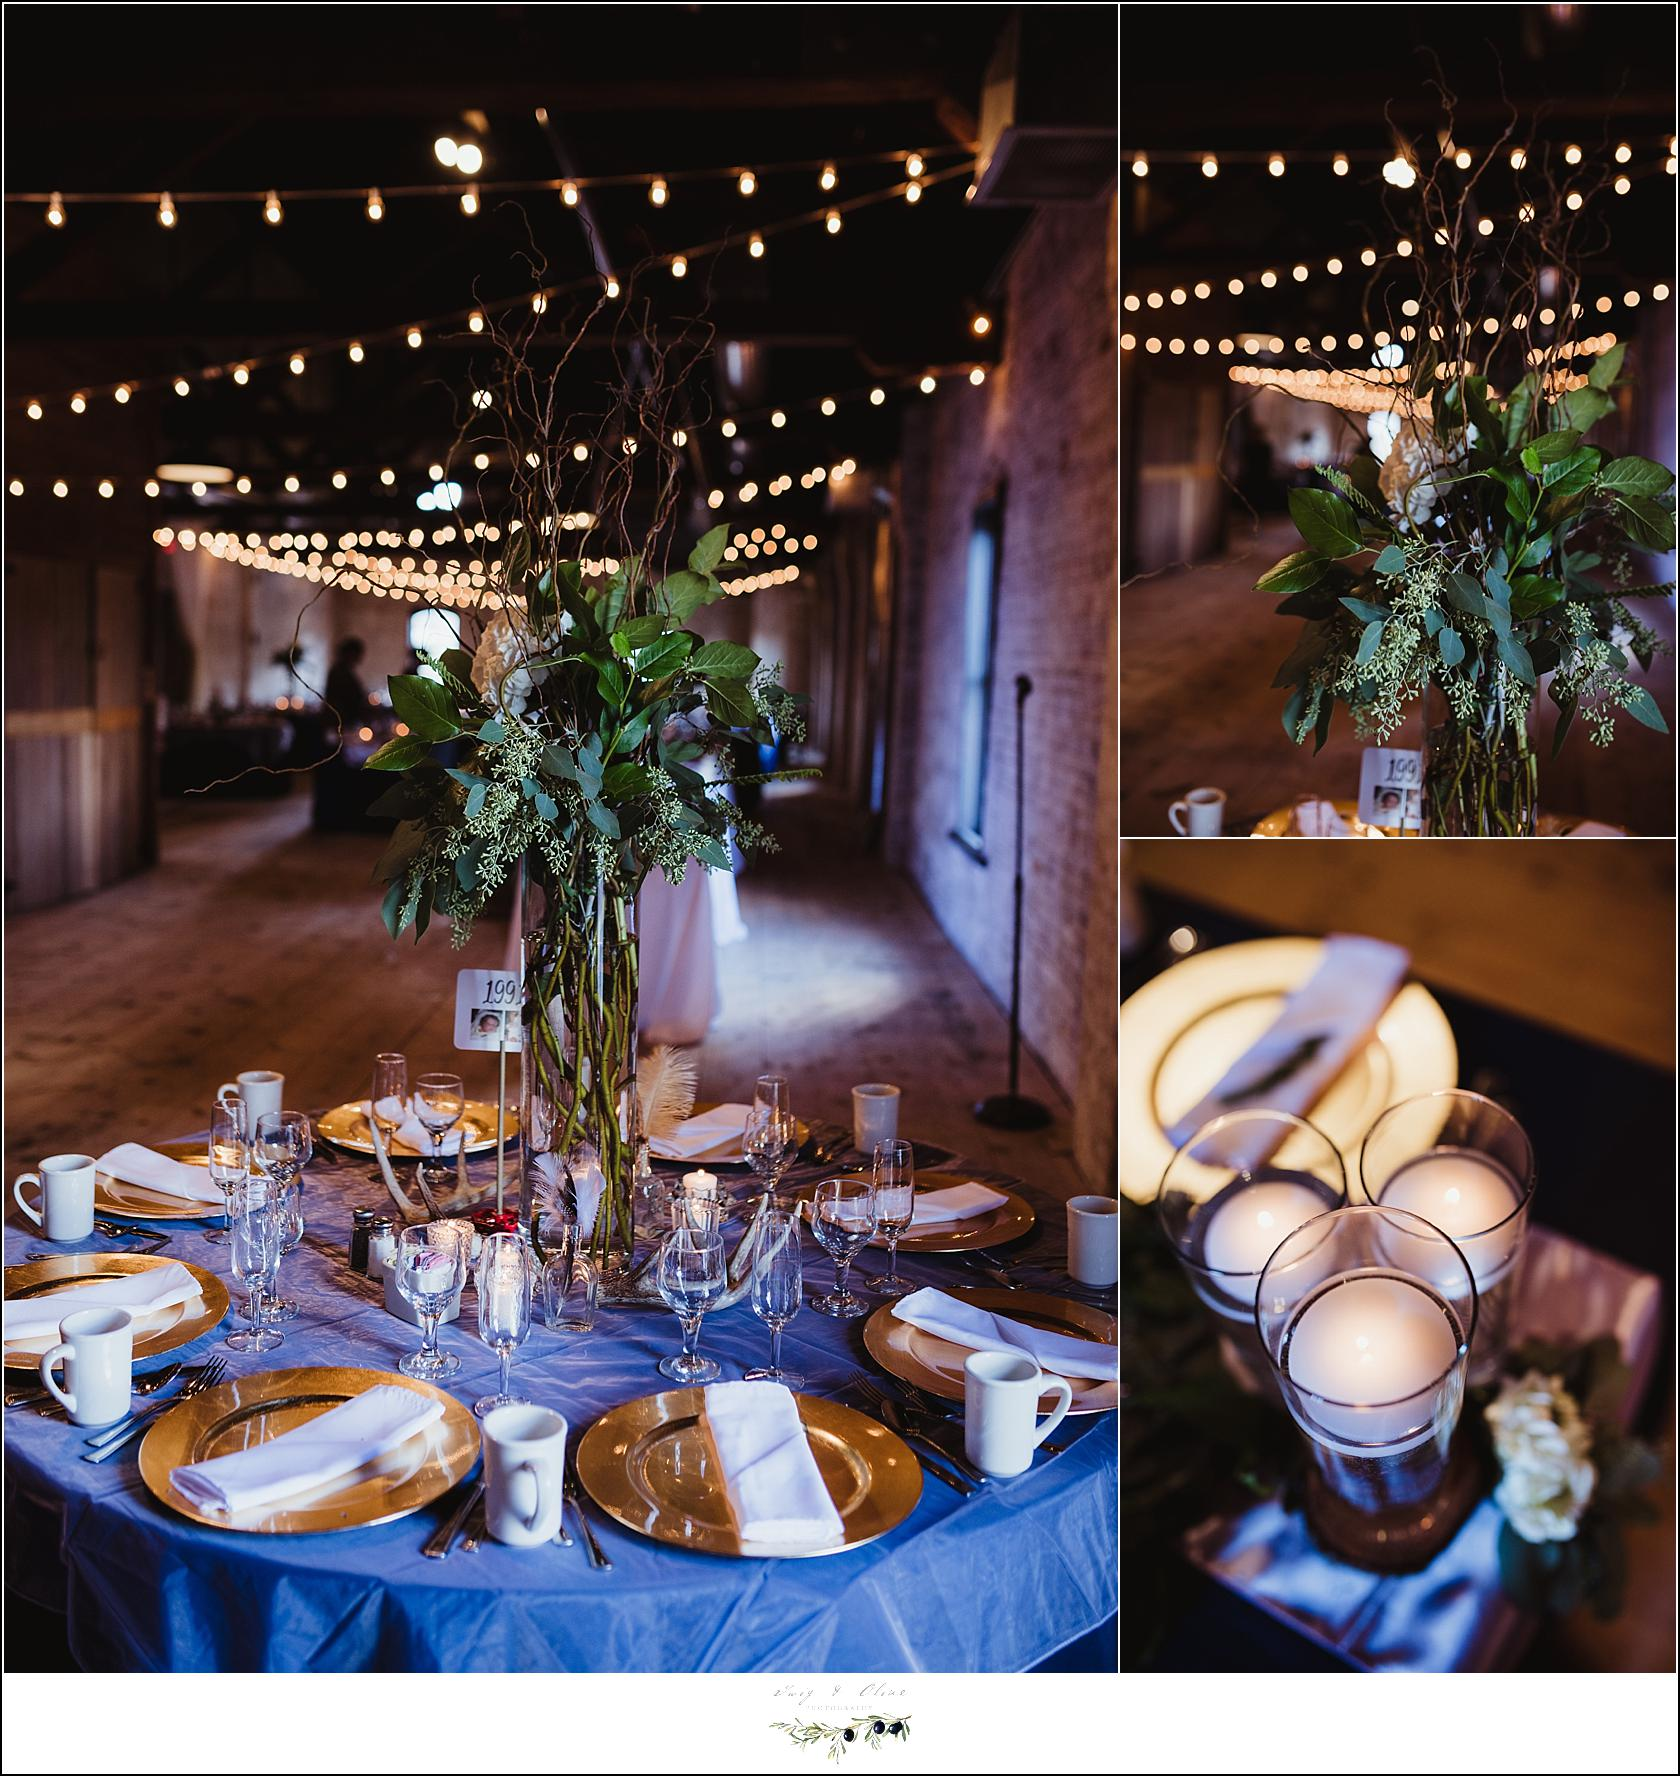 Twig & Olive PhotographyVintage Wedding Details, The